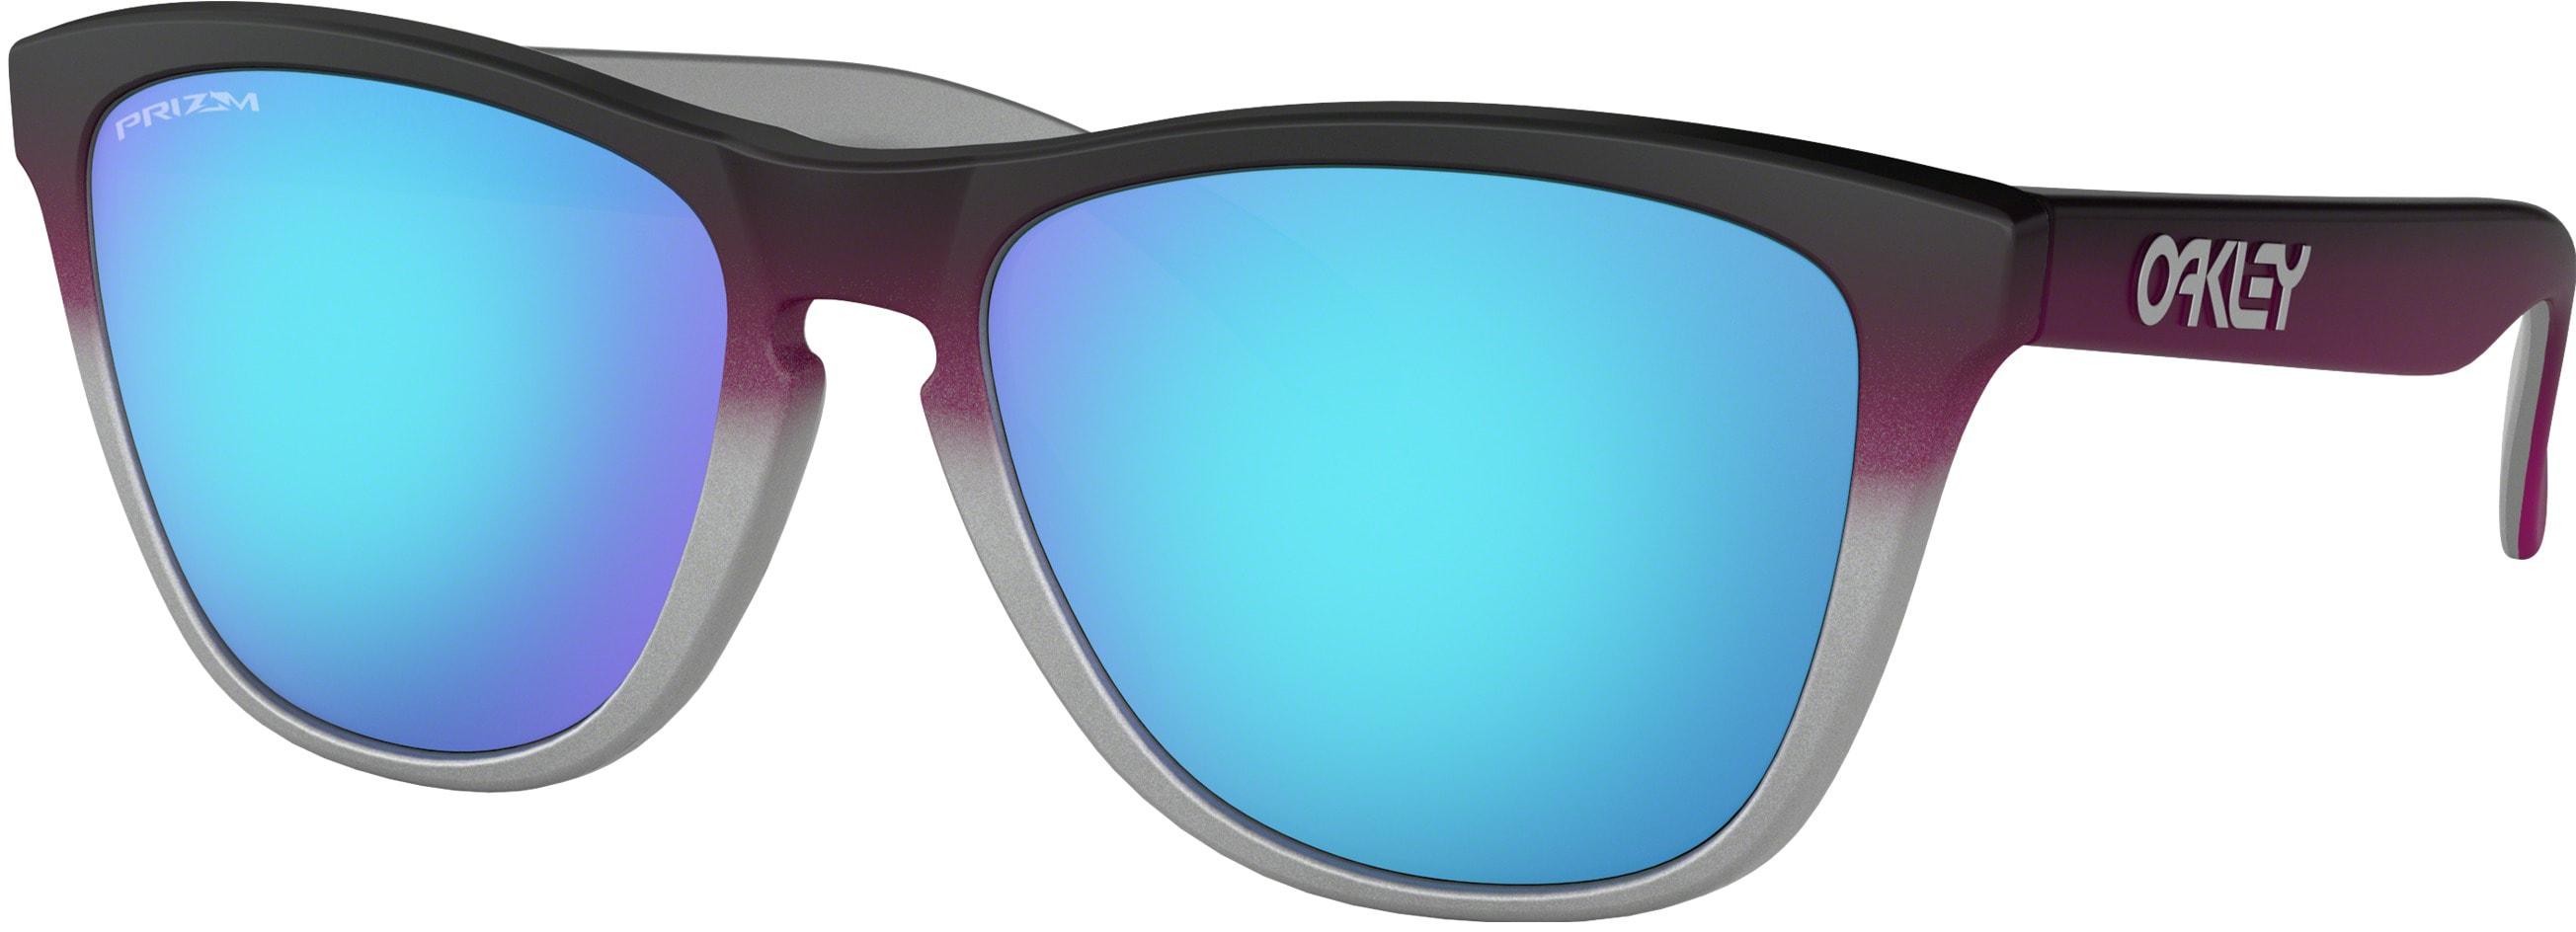 58583cbda2 Oakley Frogskins Splatterfade Collection Sunglasses - thumbnail 1